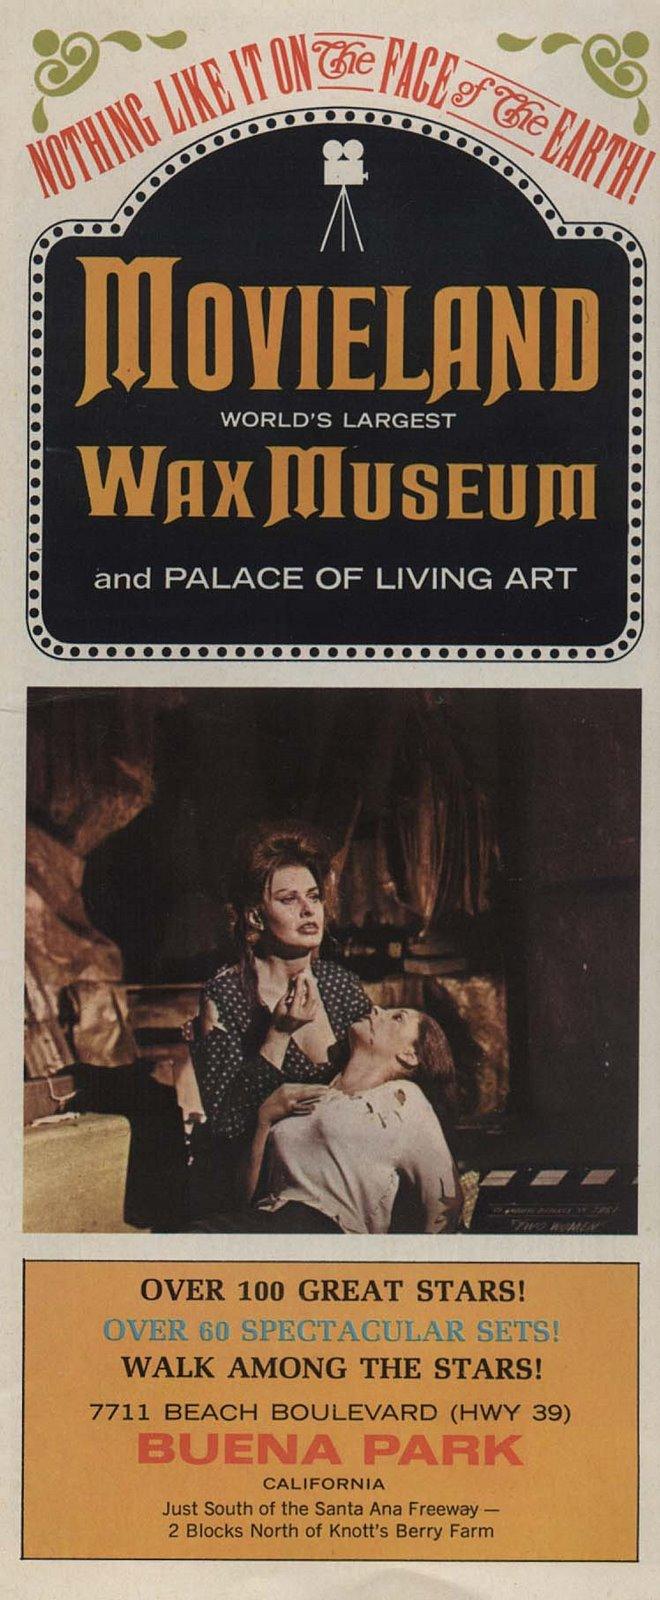 Movieland-wax-museum-780461